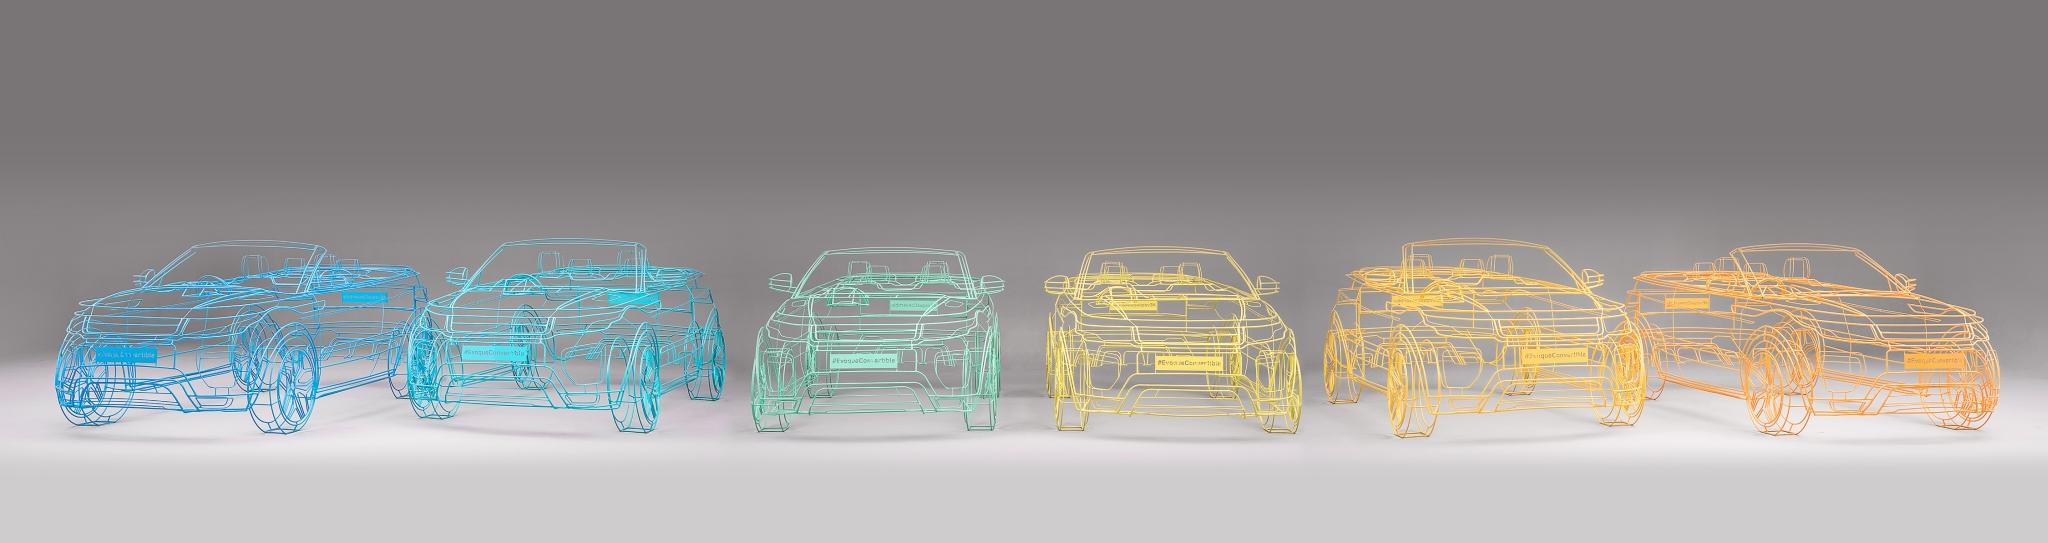 Land Rover Range Rover Evoque Convertible Wireframe Studio 006